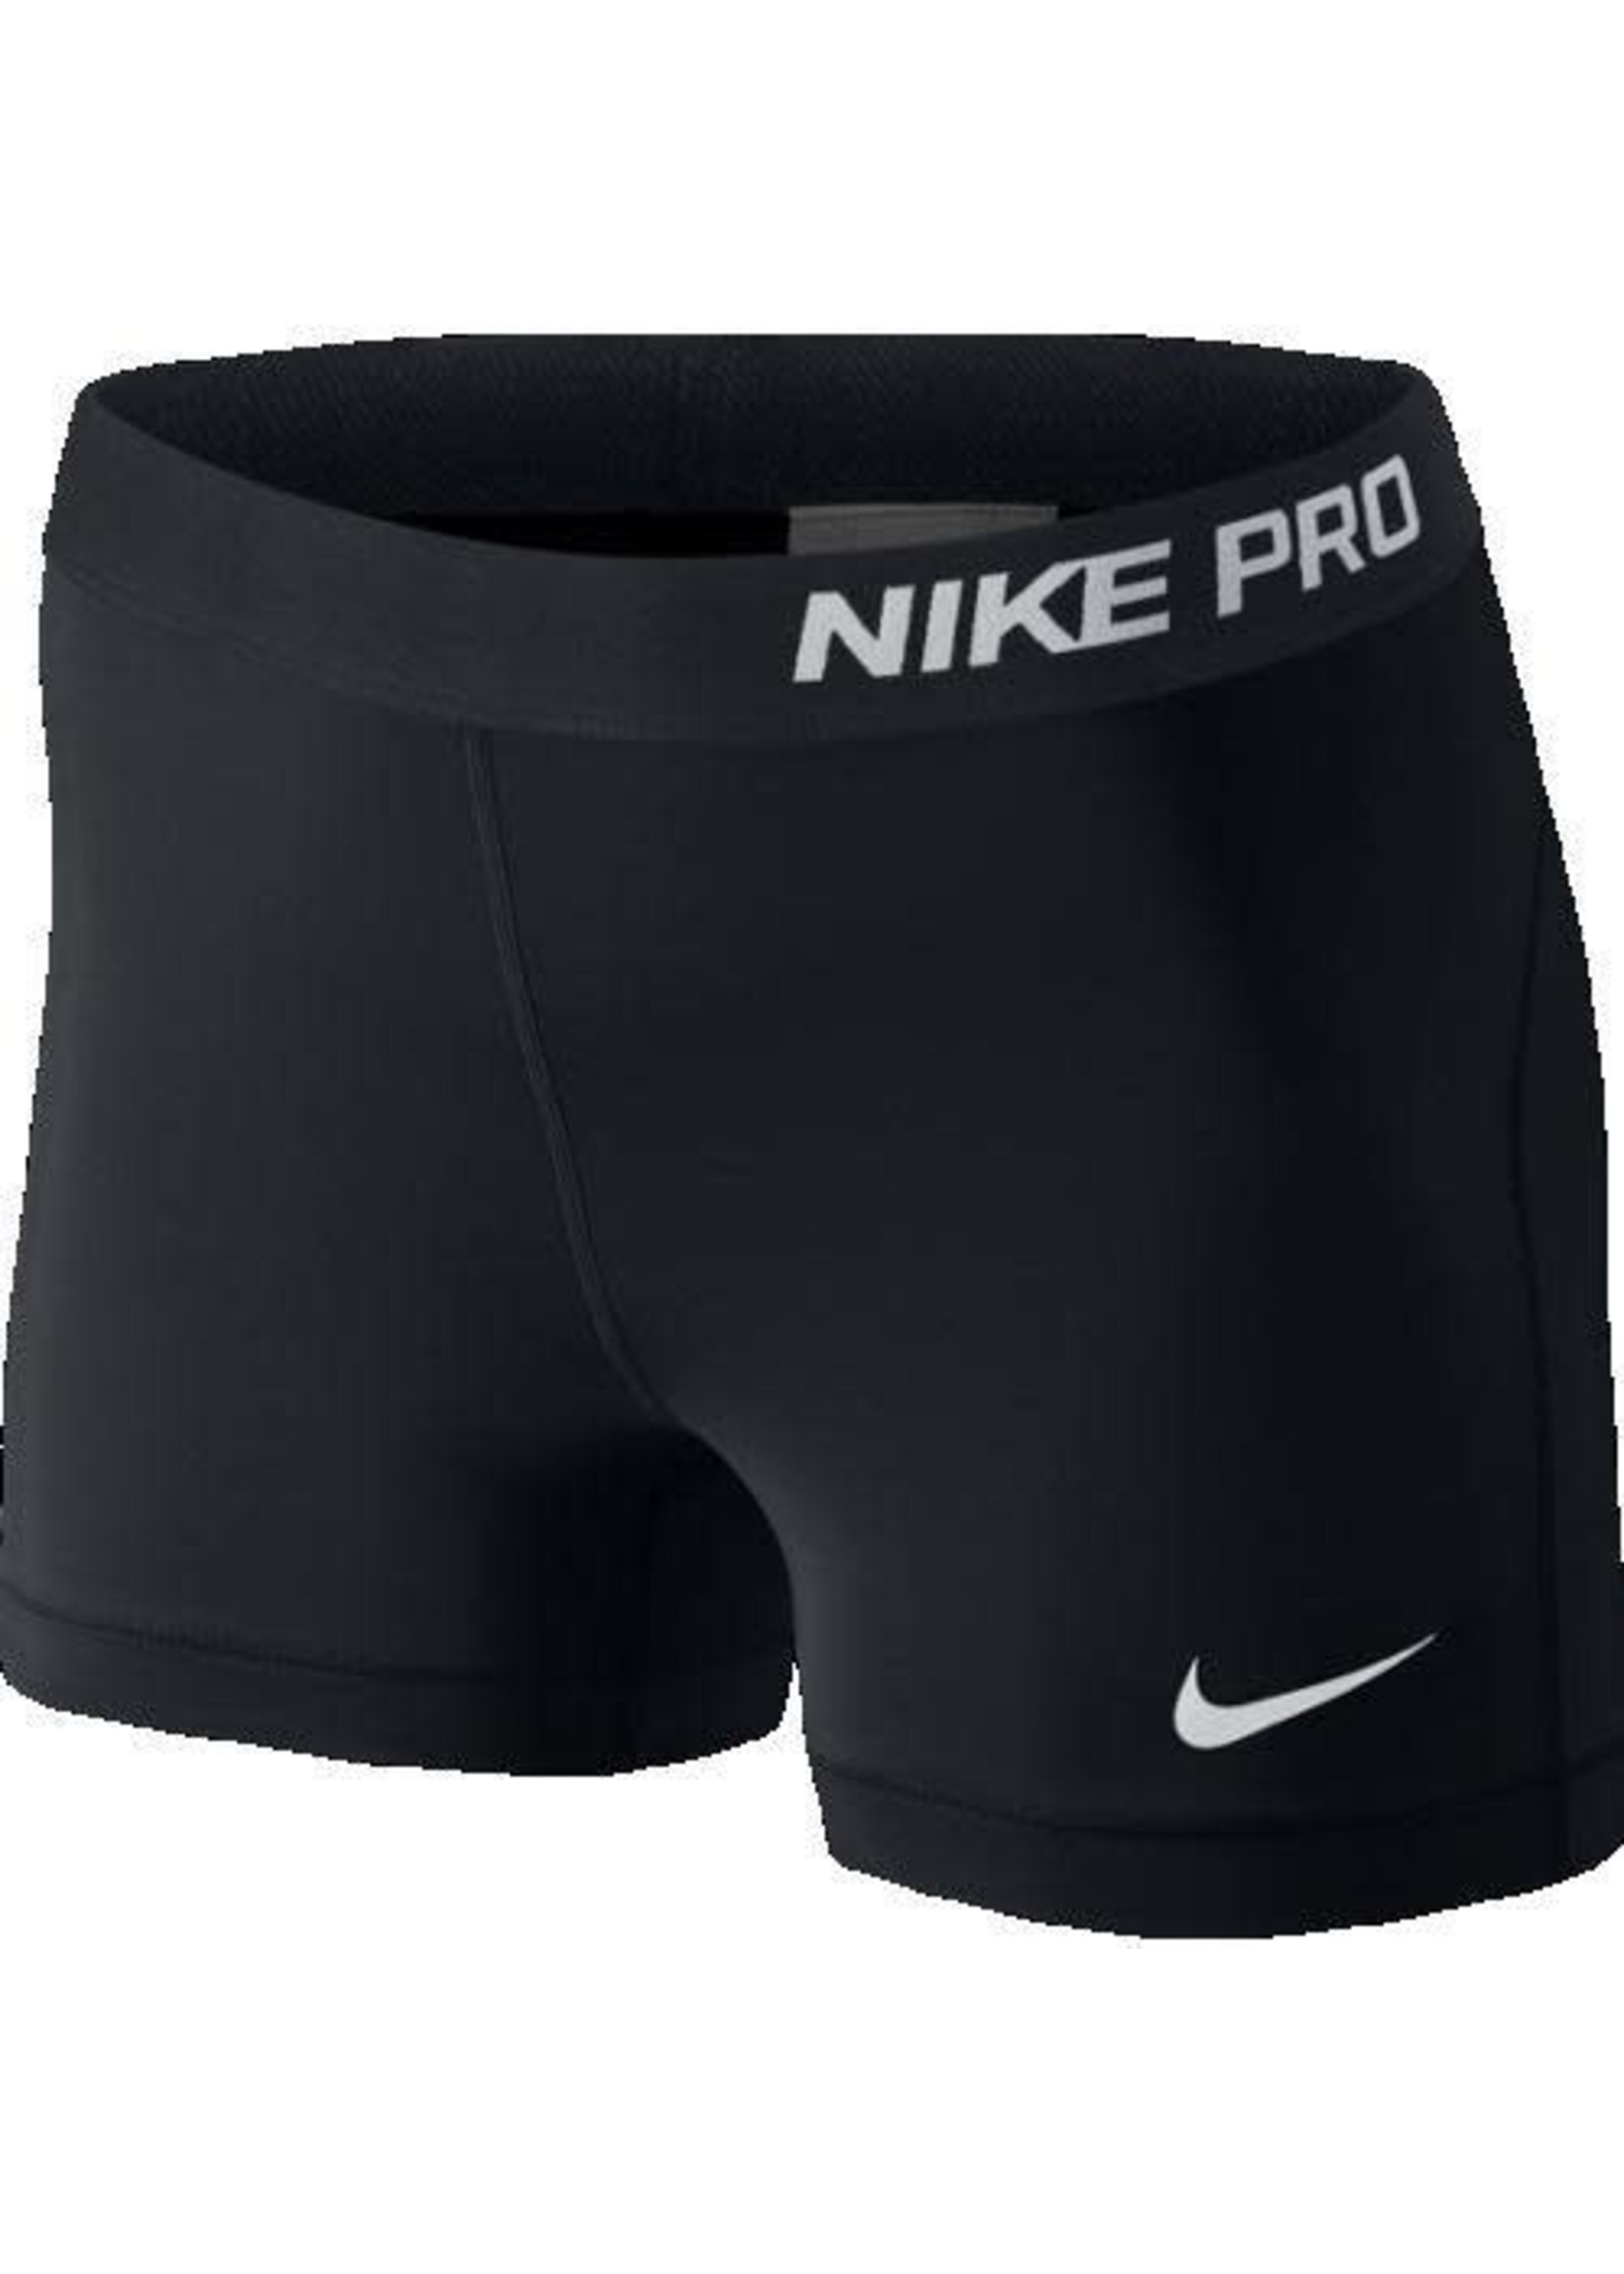 Nike Pro Compression Shorts Dri-Fit